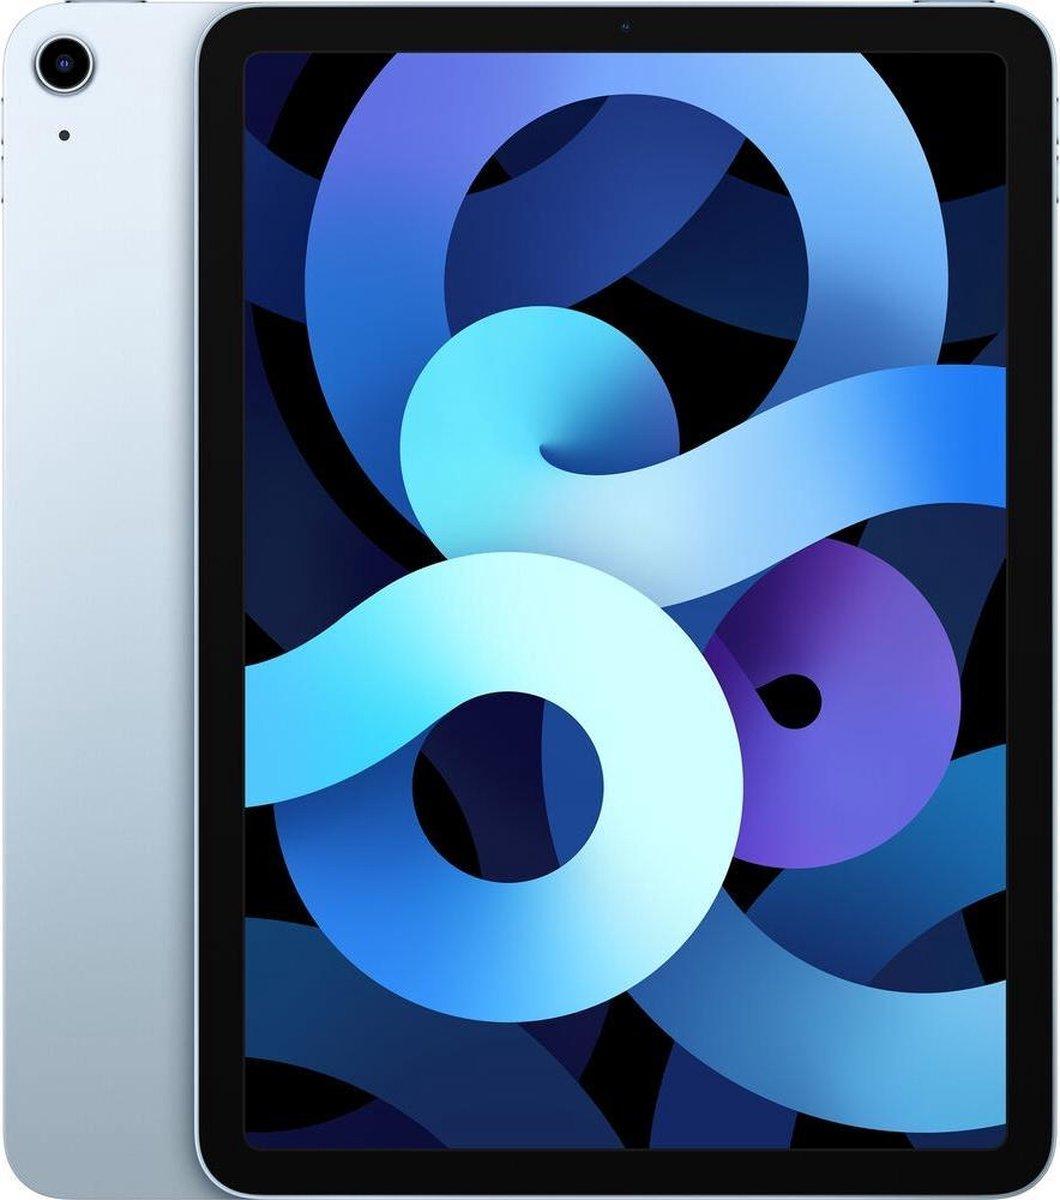 Apple iPad Air 4 - Renoverad door SUPREME MOBILE - A Grade - Endast WiFi - 64 GB - Blå